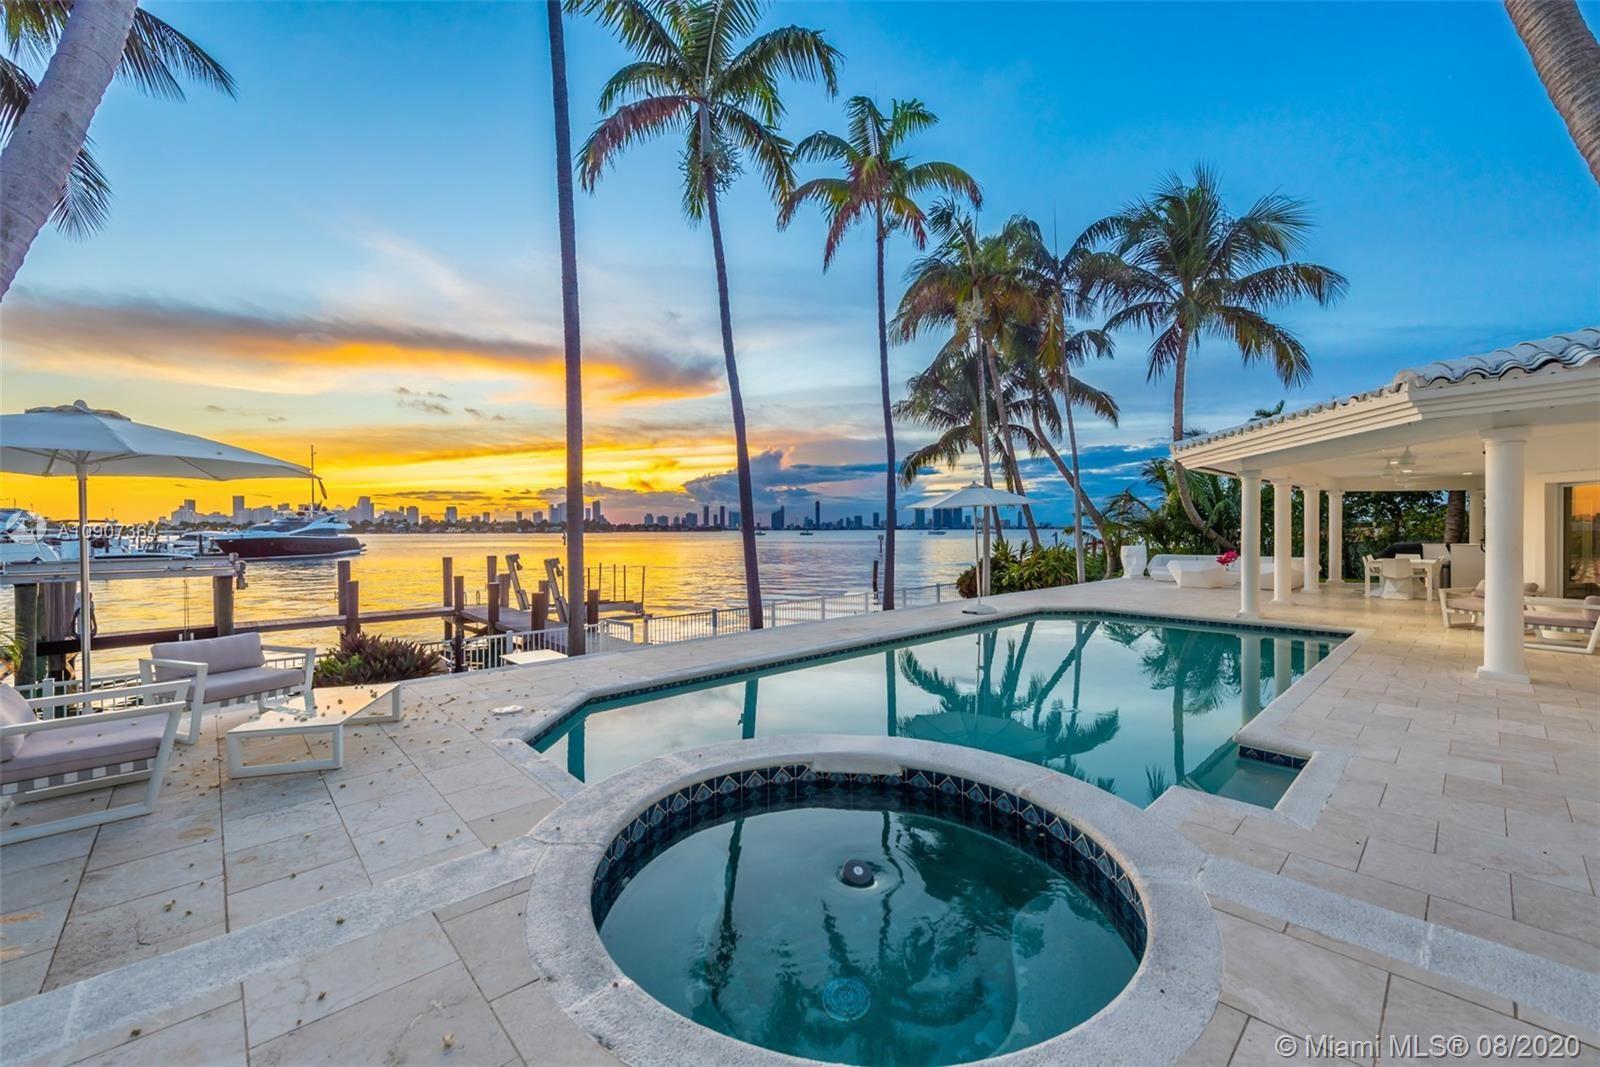 Photo of 2120 Bay Ave, Miami Beach, FL 33140 (MLS # A10907364)